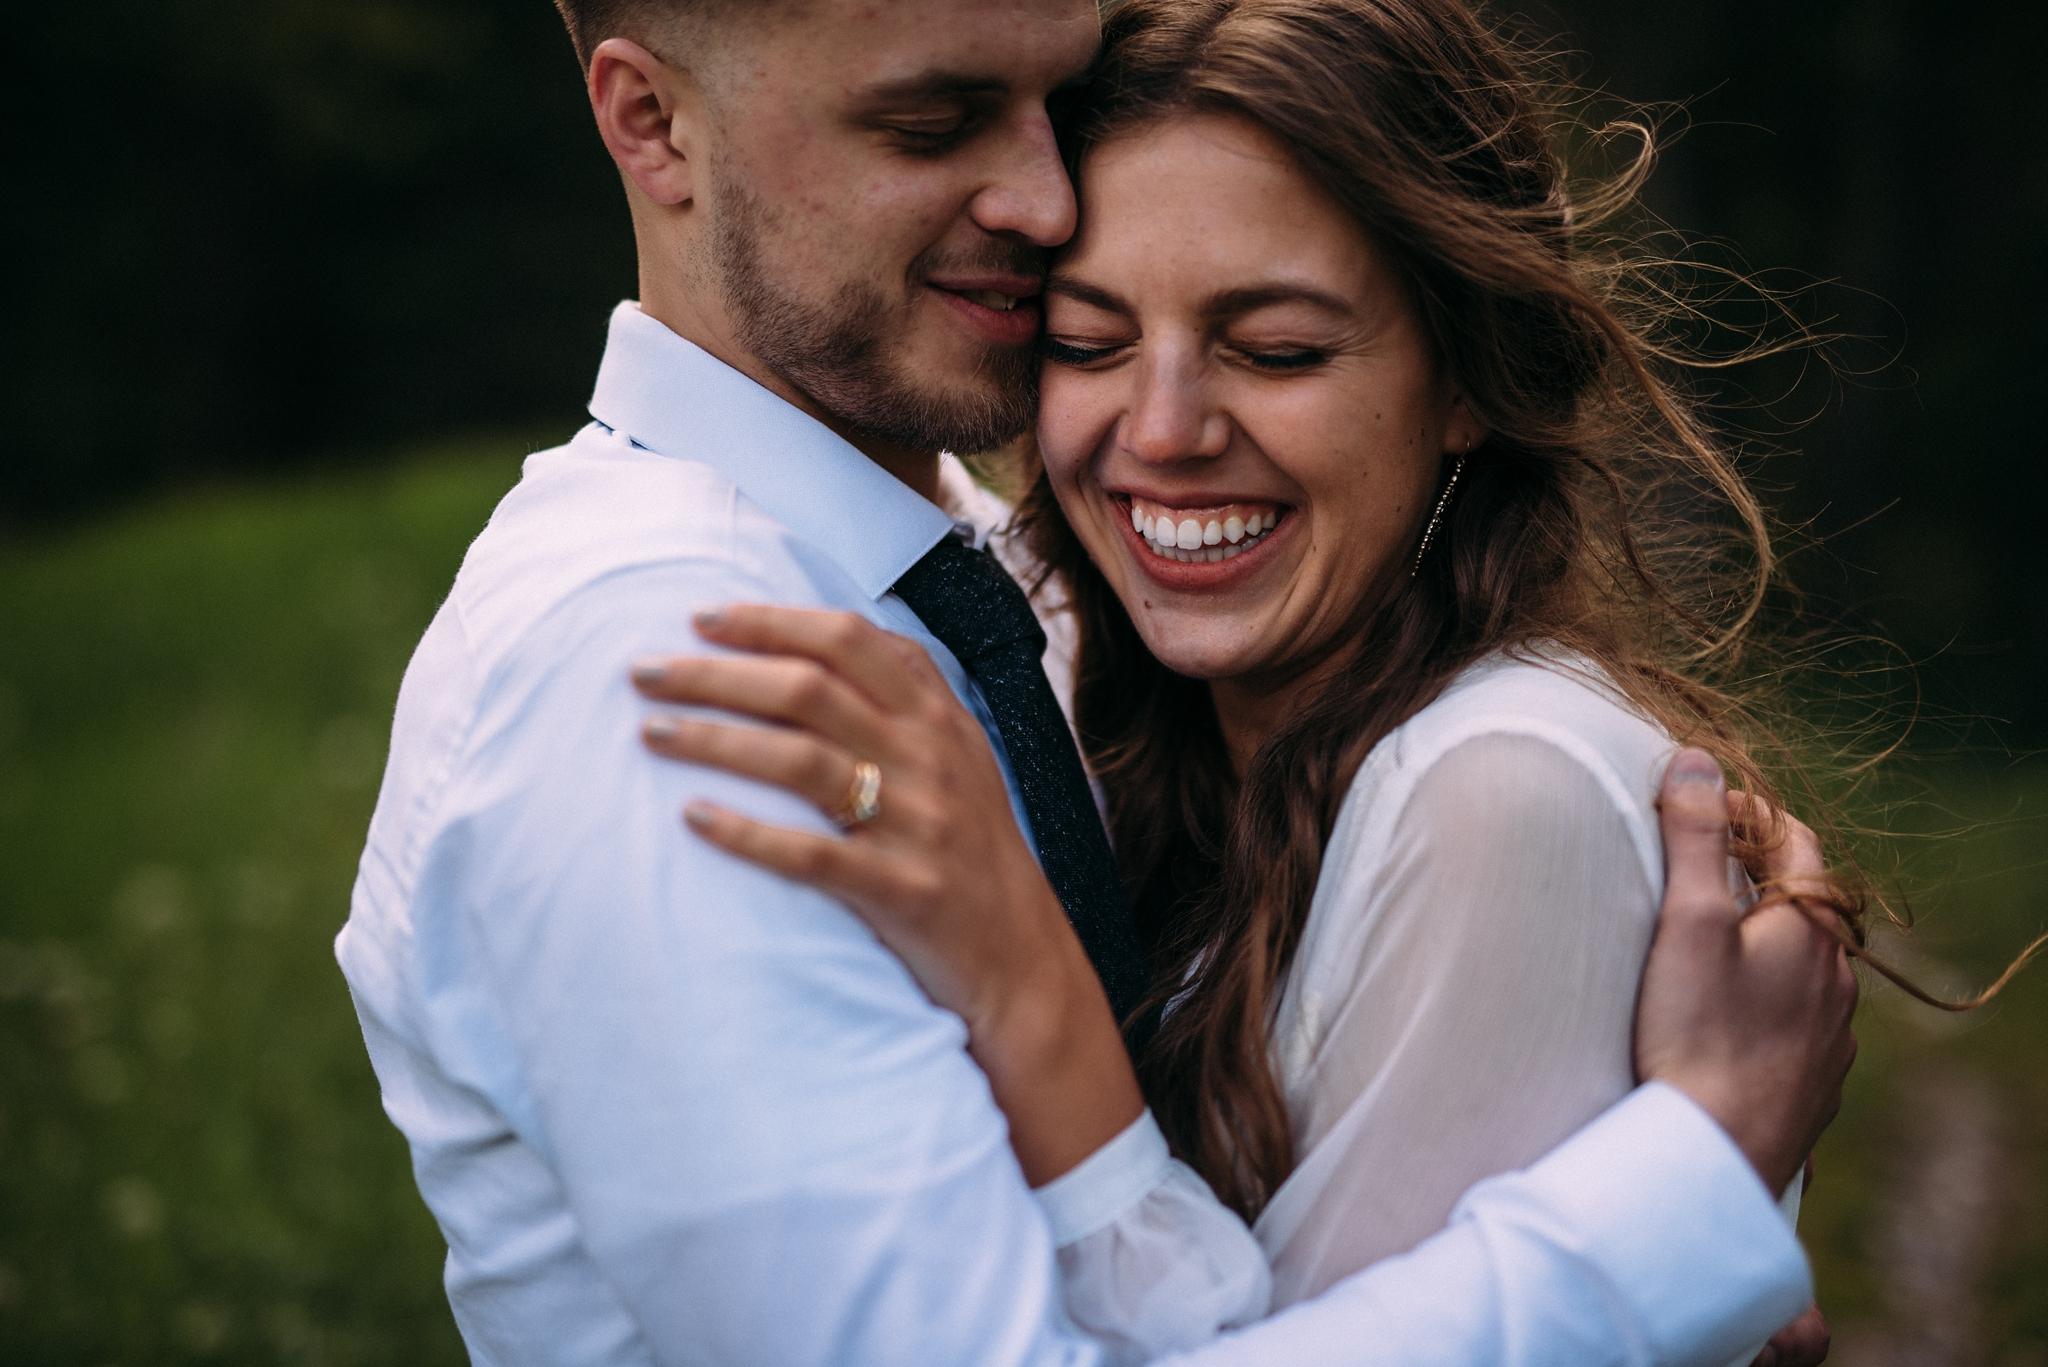 kaihla_tonai_intimate_wedding_elopement_photographer_4121